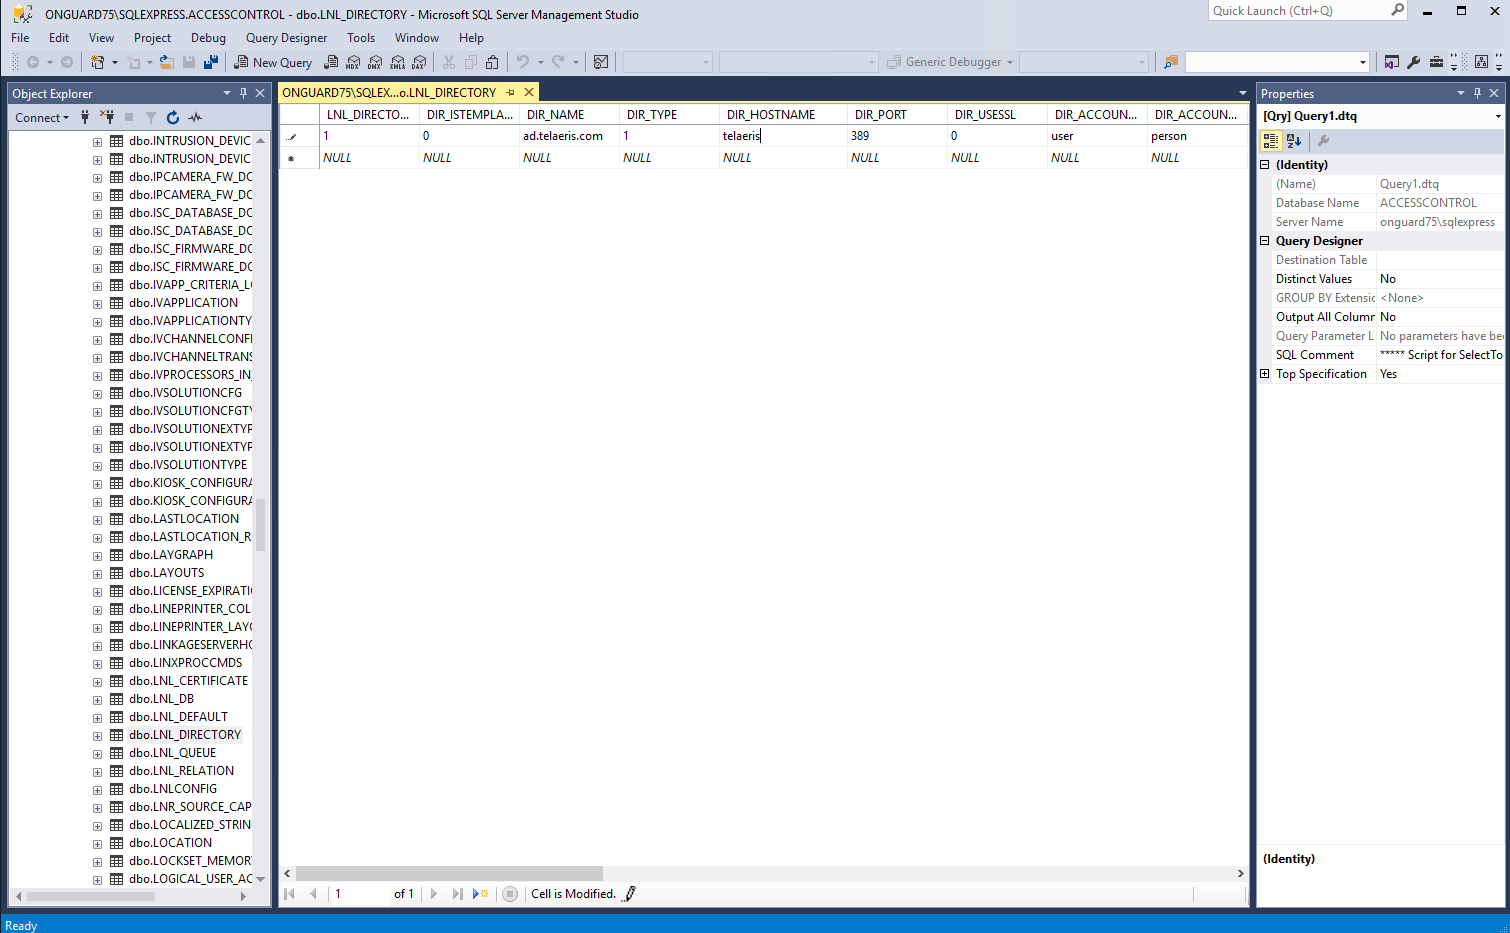 lenel onguard directory